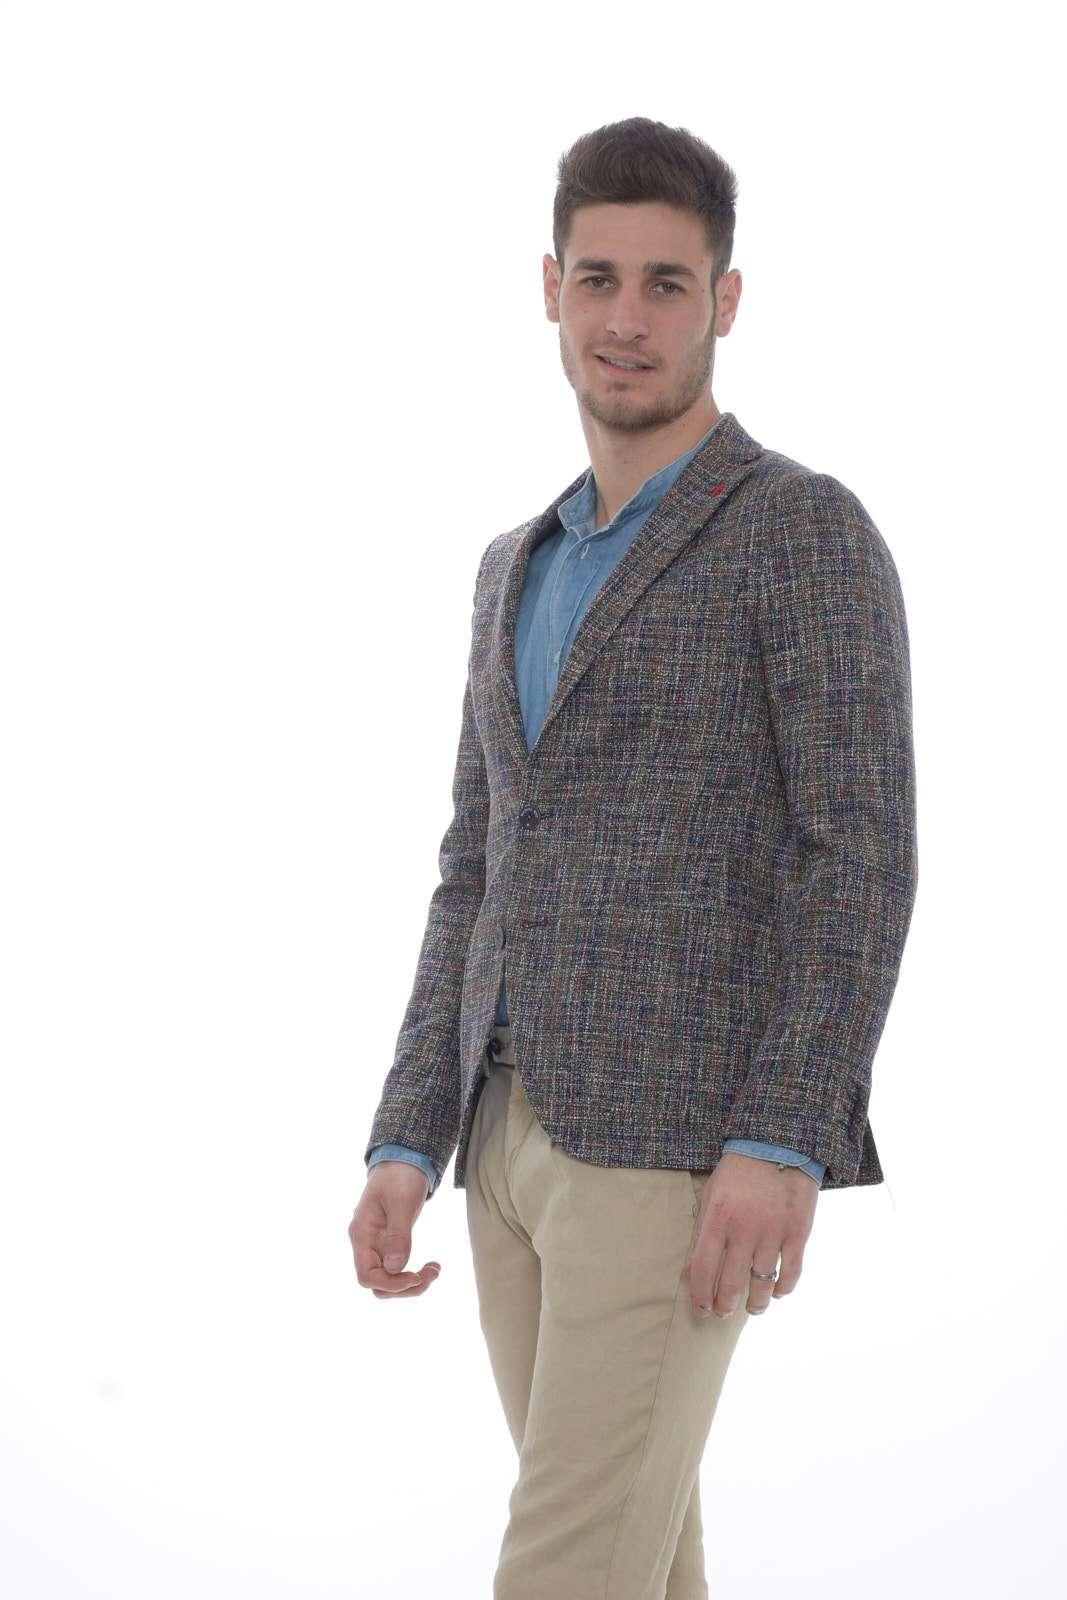 https://www.parmax.com/media/catalog/product/a/i/PE-outlet_parmax-giacca-uomo-Manuel-Ritz-2632G2038%20193165-B.jpg